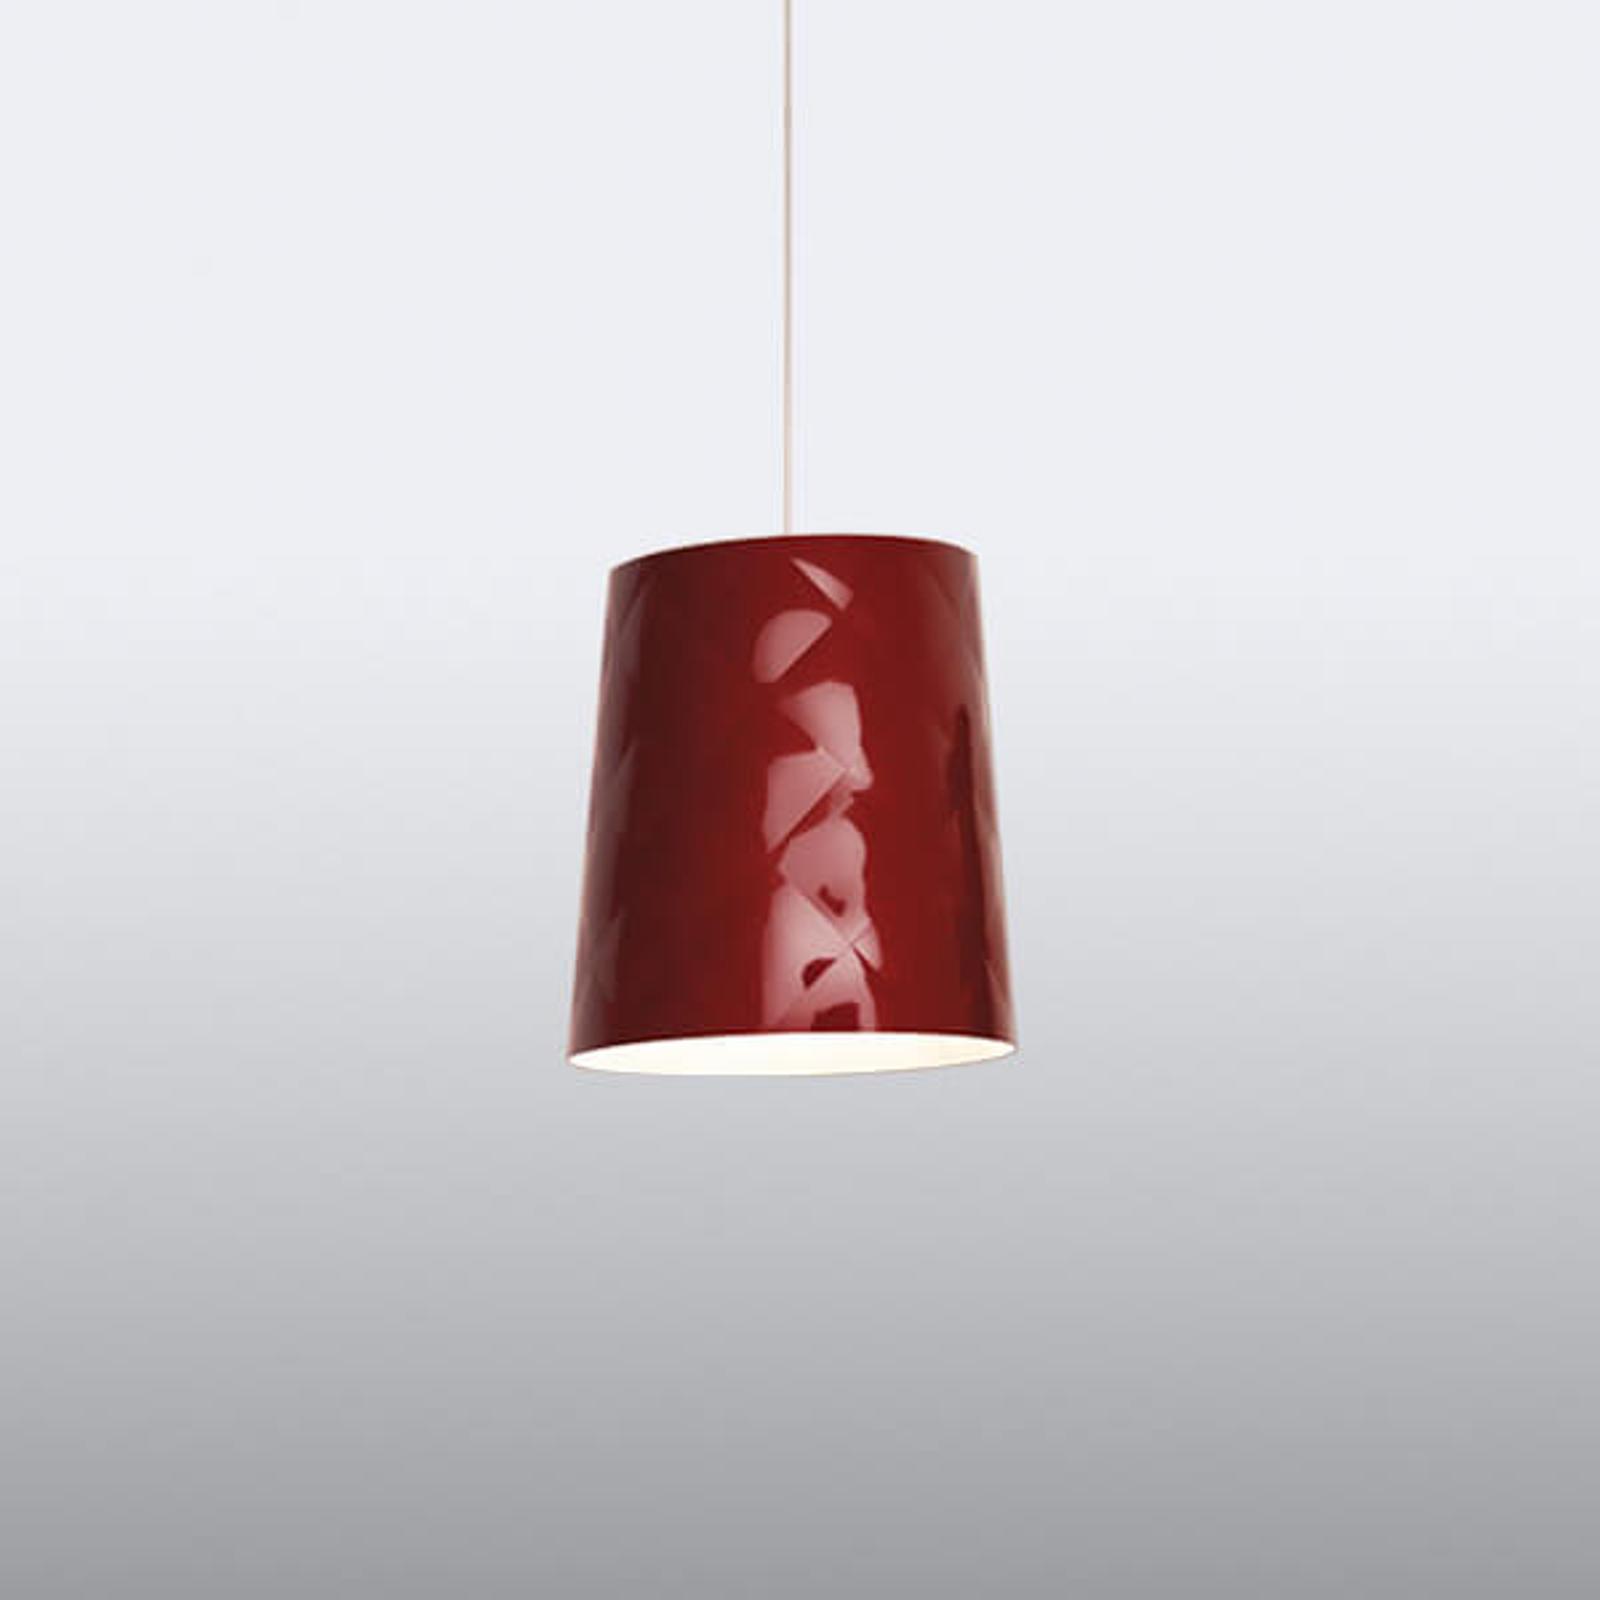 Kundalini New York hanglamp, Ø 33 cm, rood